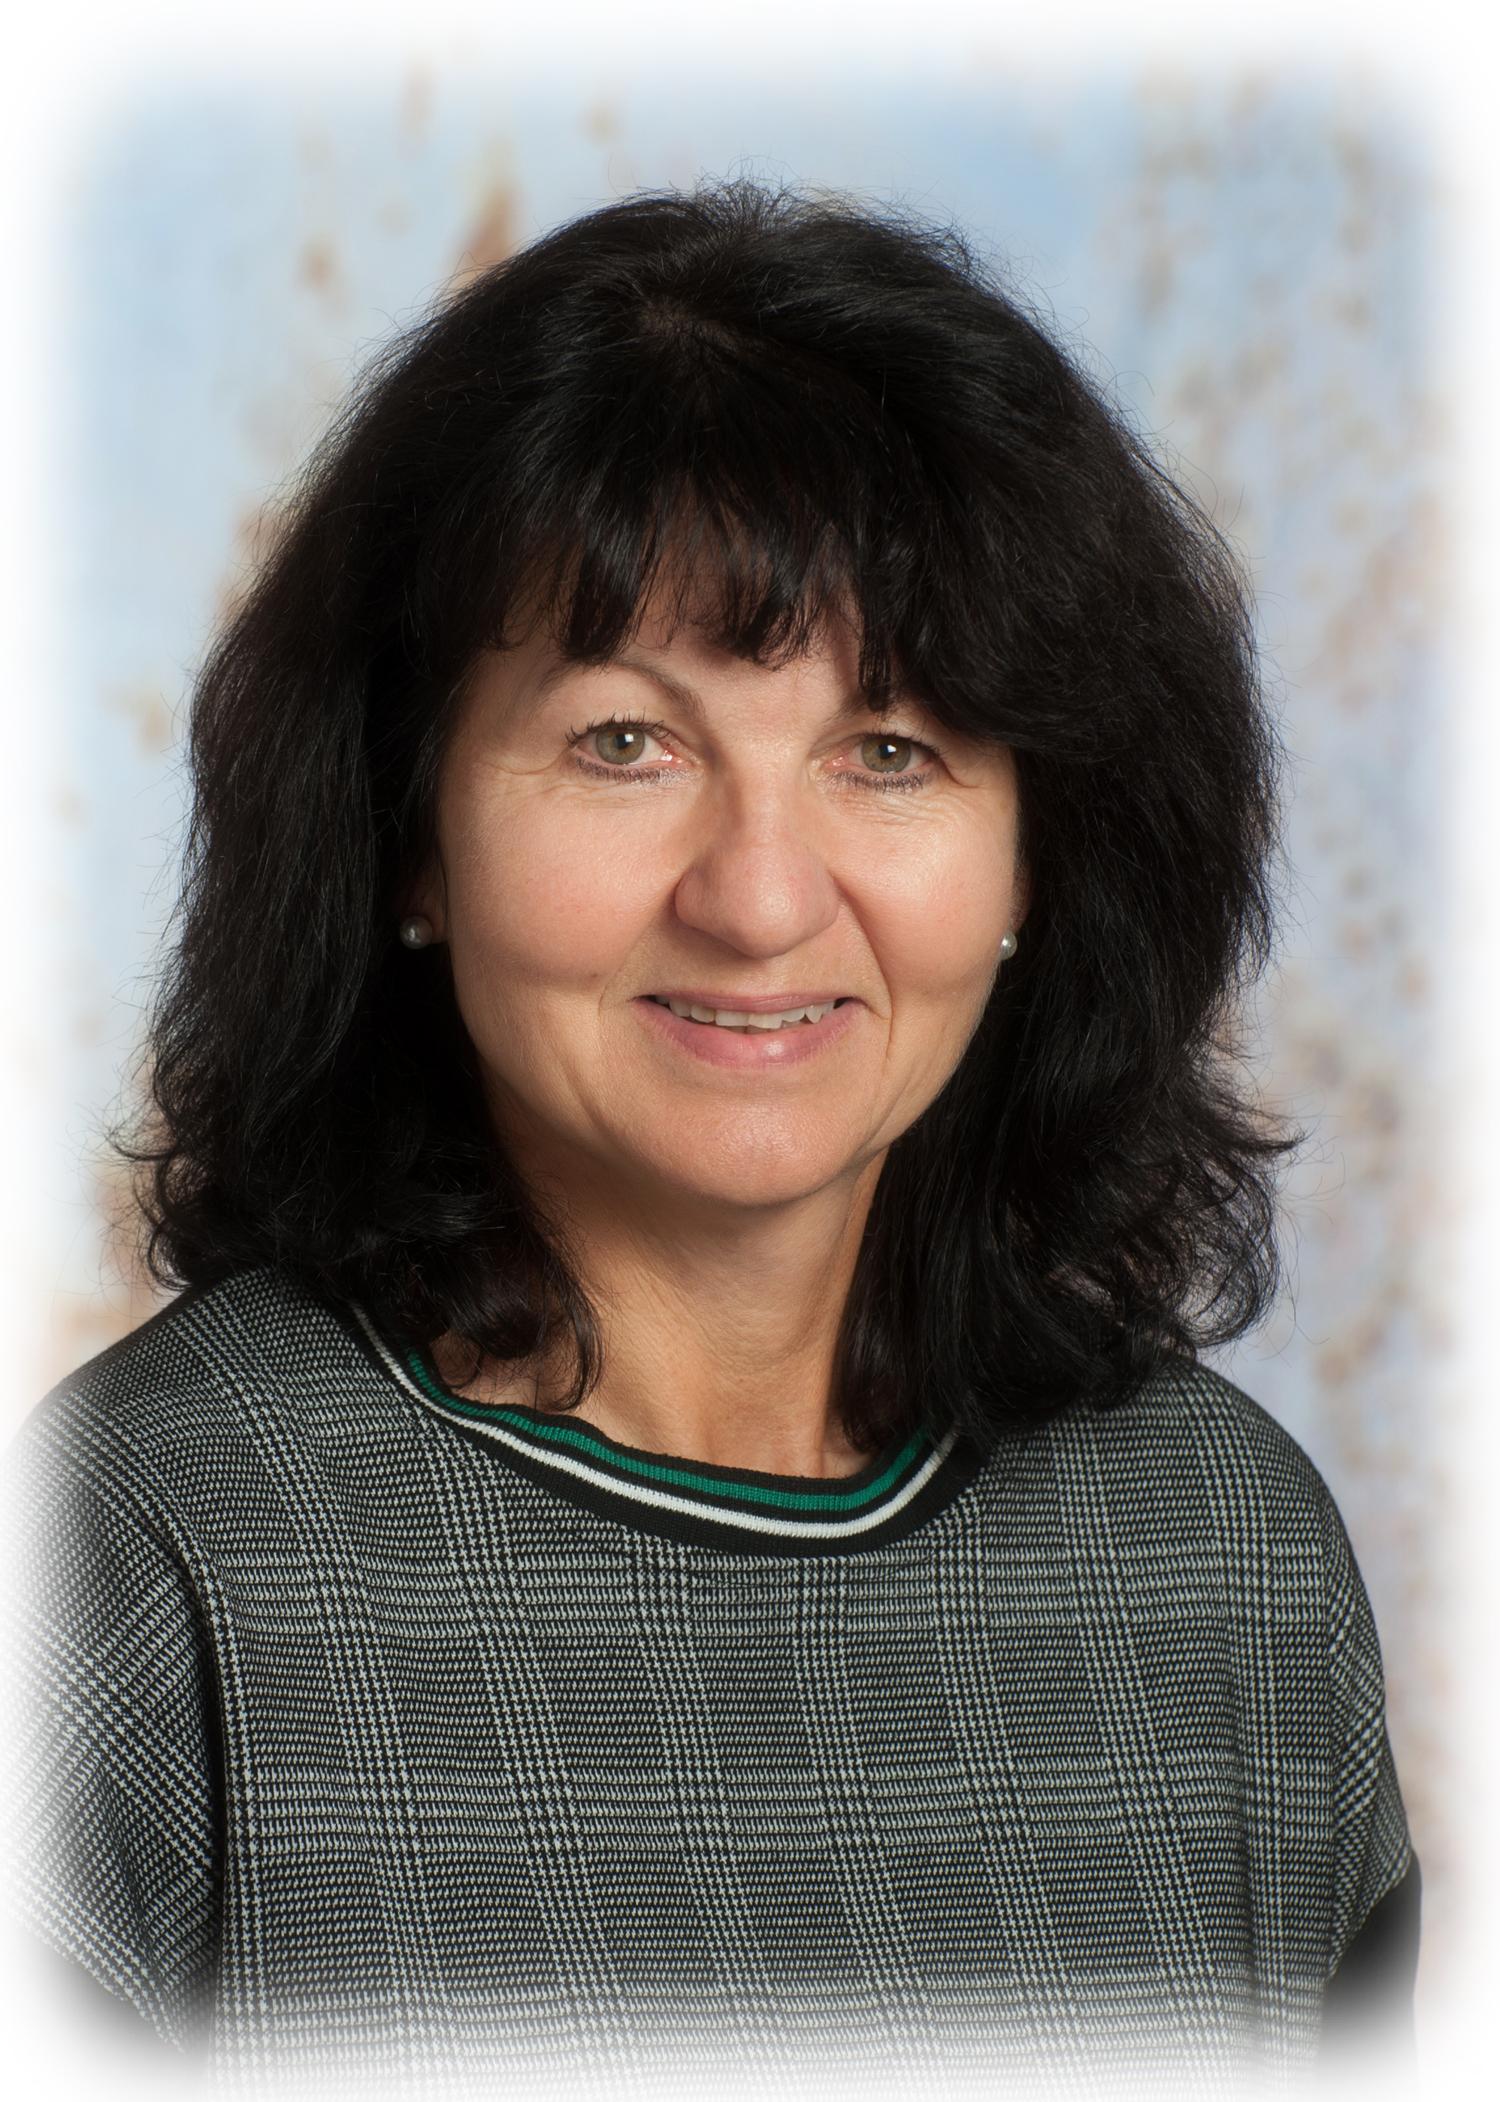 Elisabeth Bauer